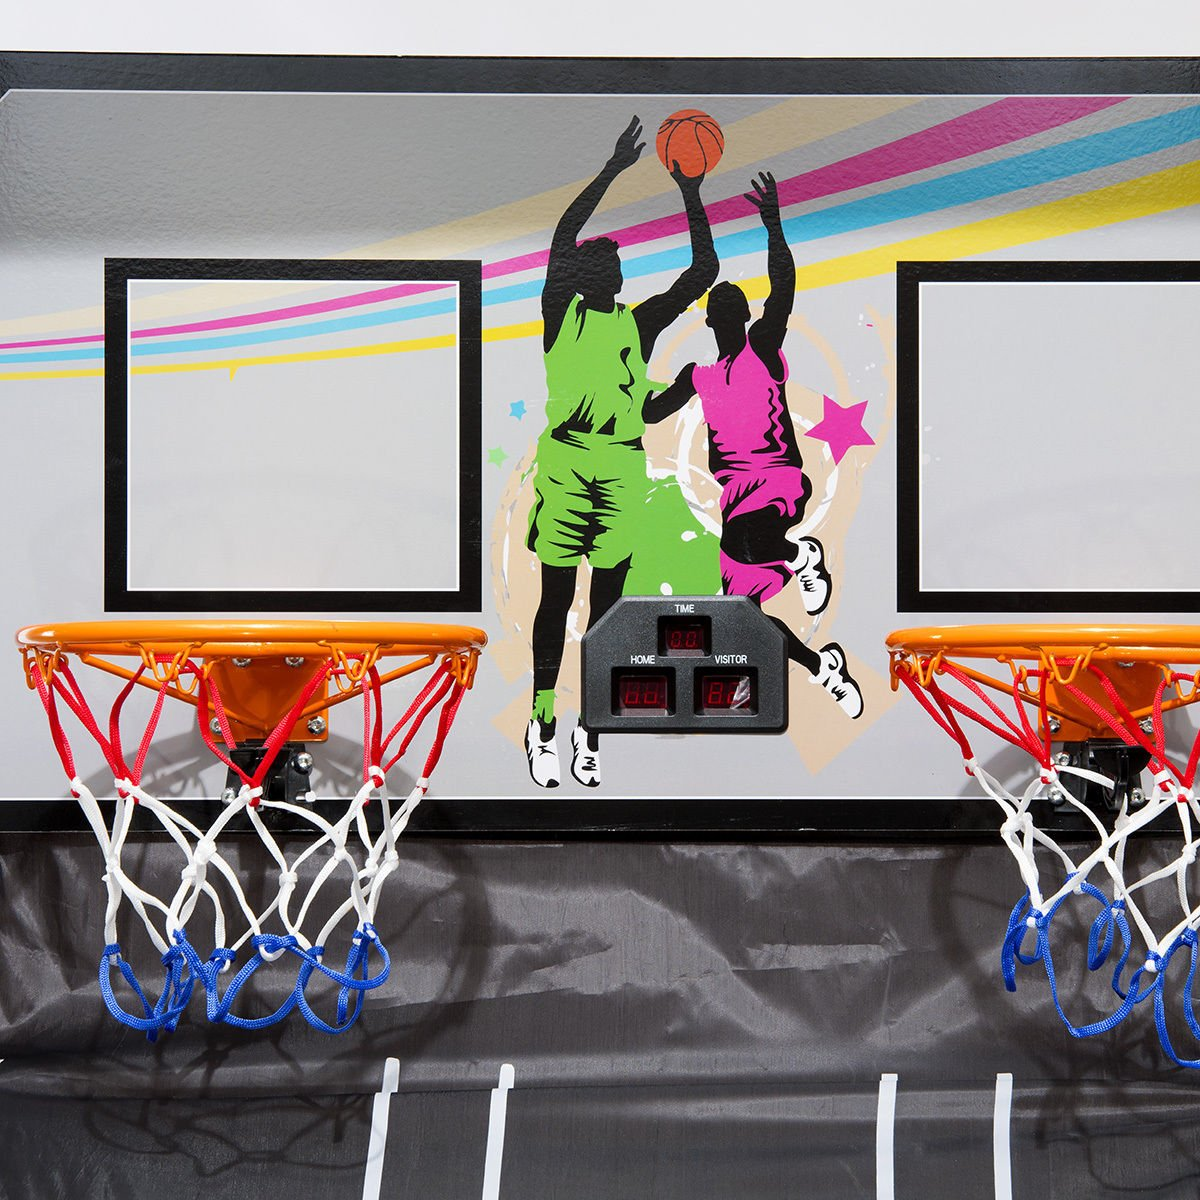 amazon com giantex indoor basketball arcade game double